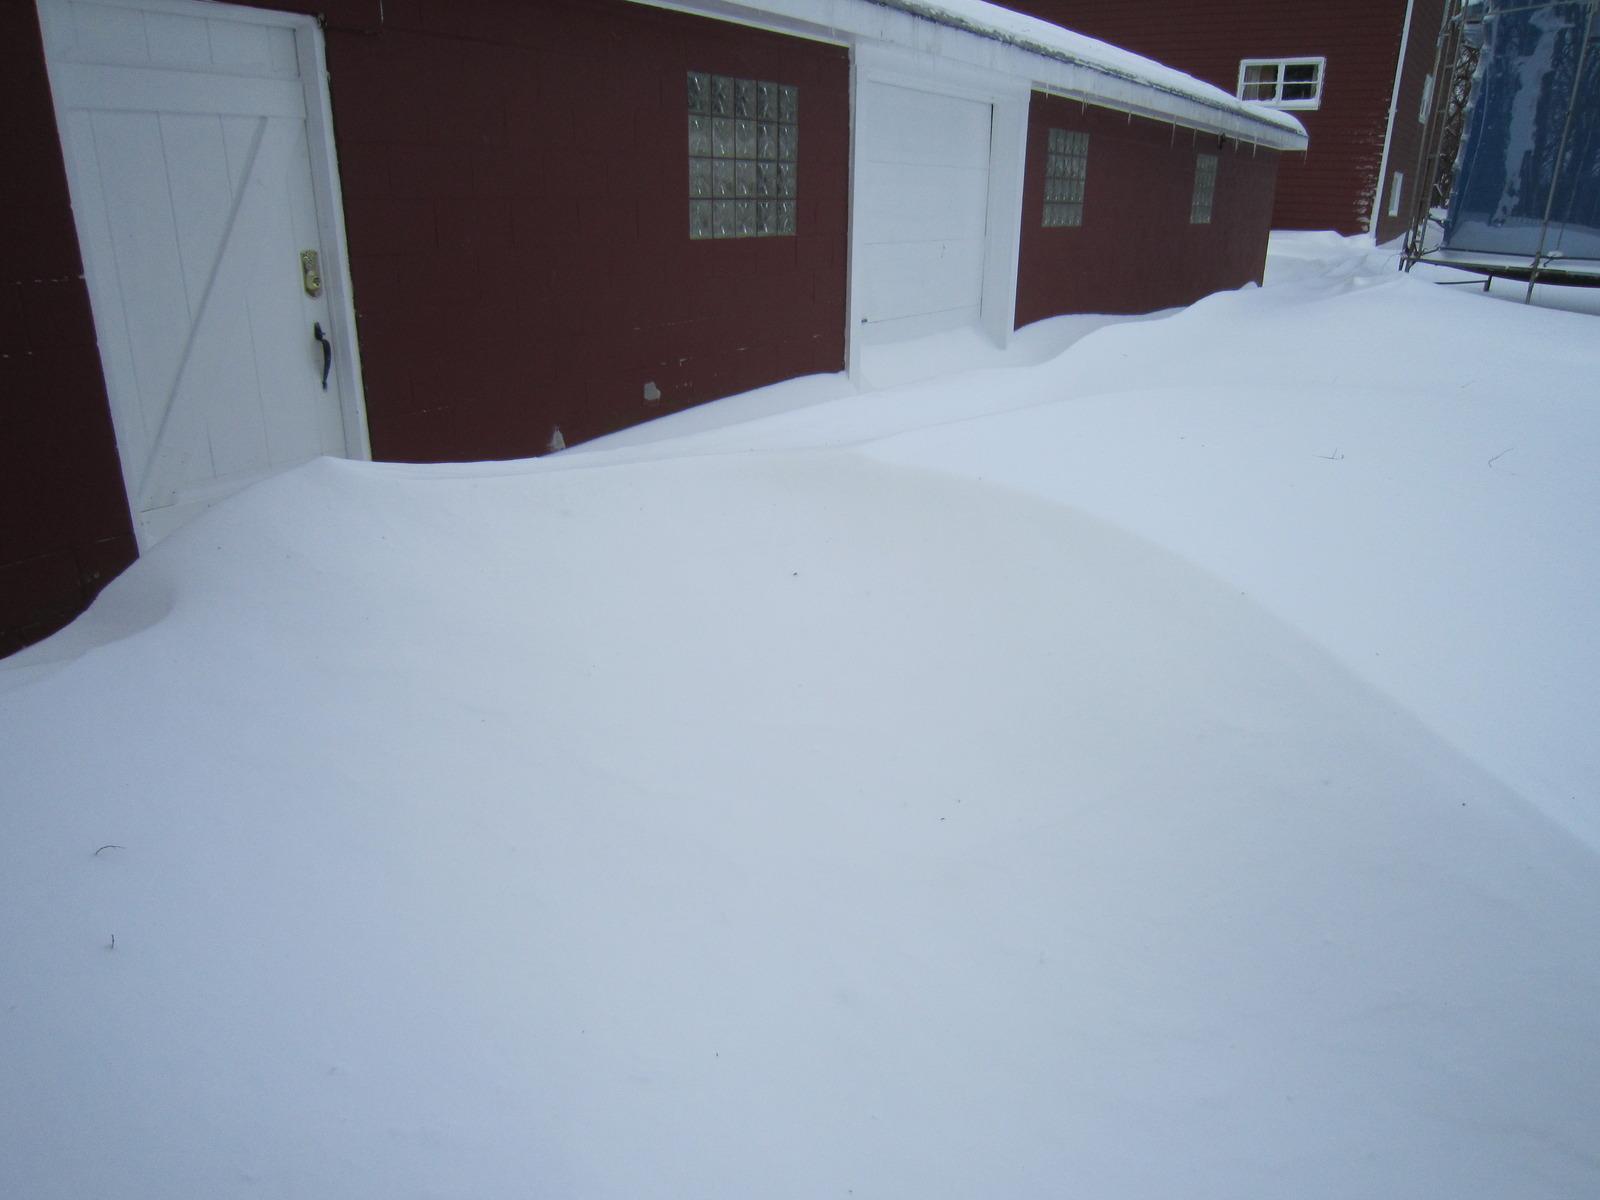 Blizzard feb 2 2011 (3)